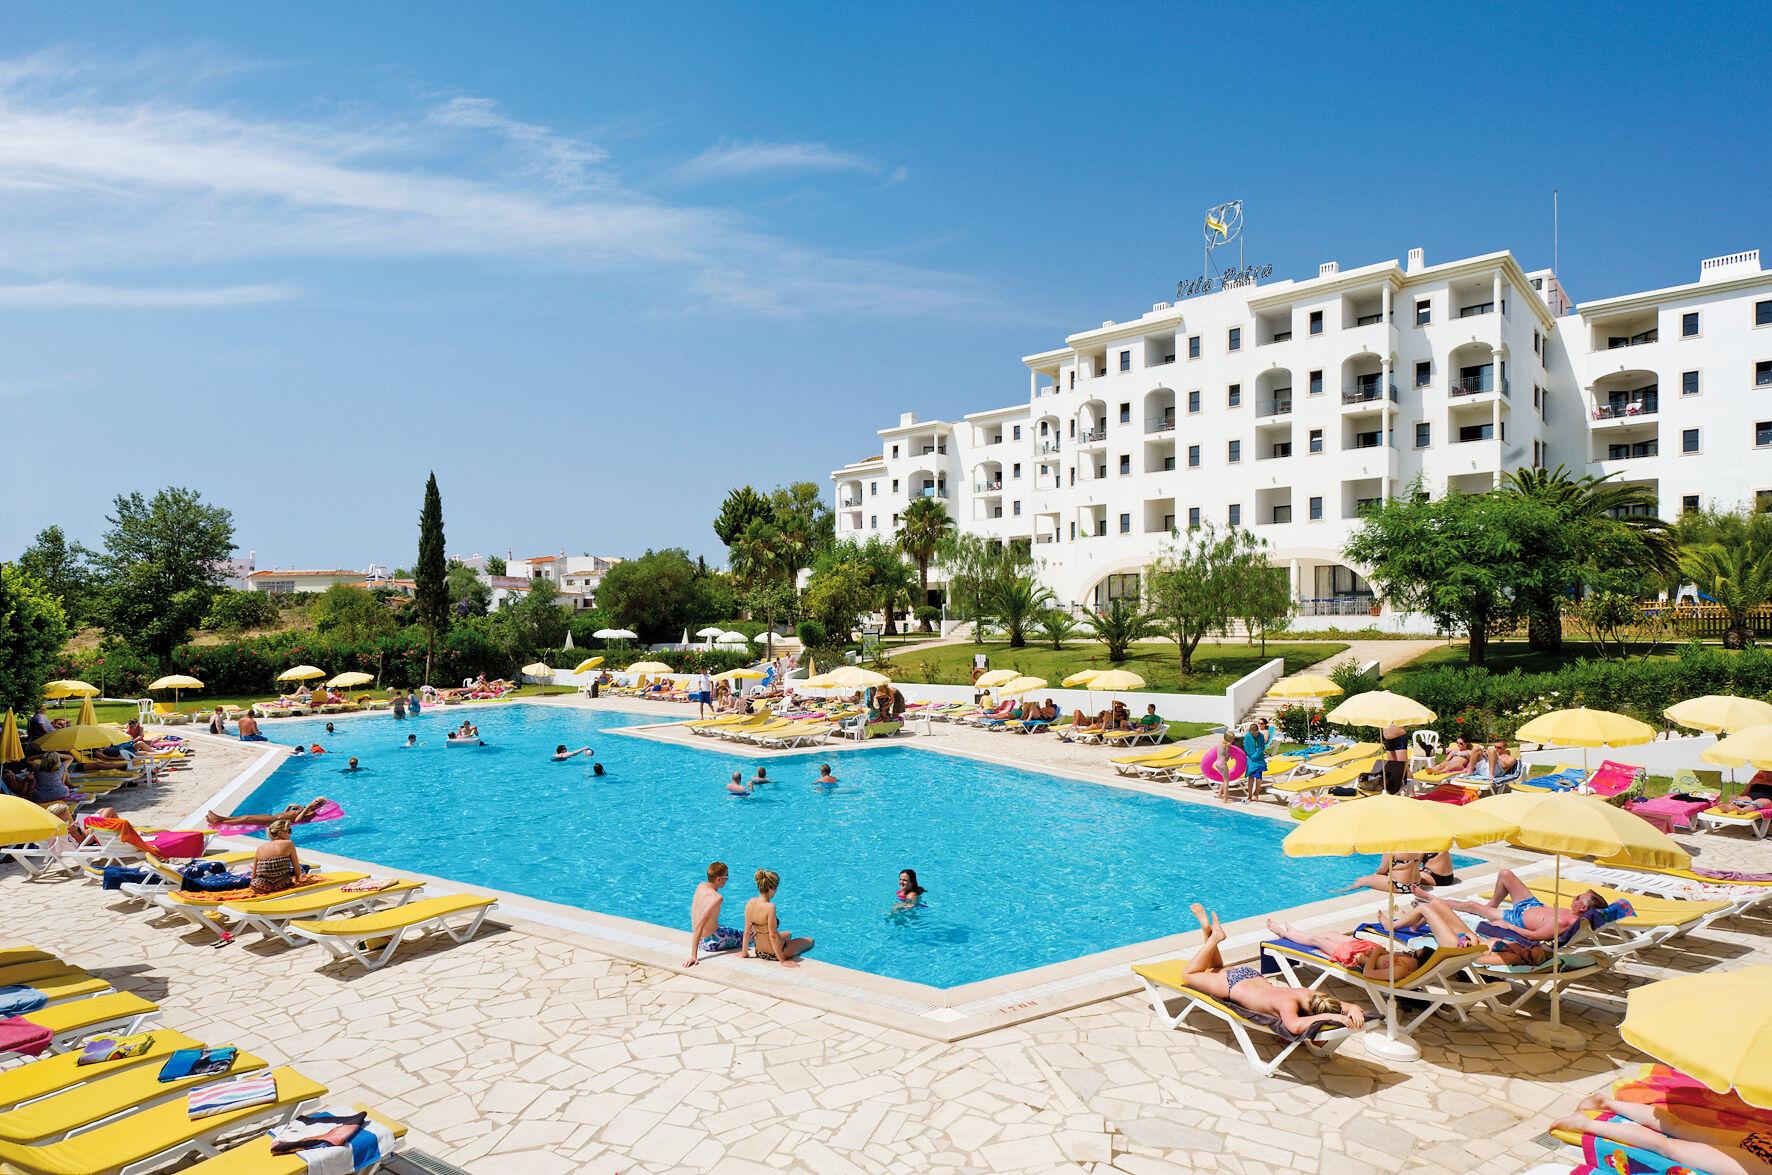 Portugal - Algarve - Albufeira - Hôtel Vila Petra 4*